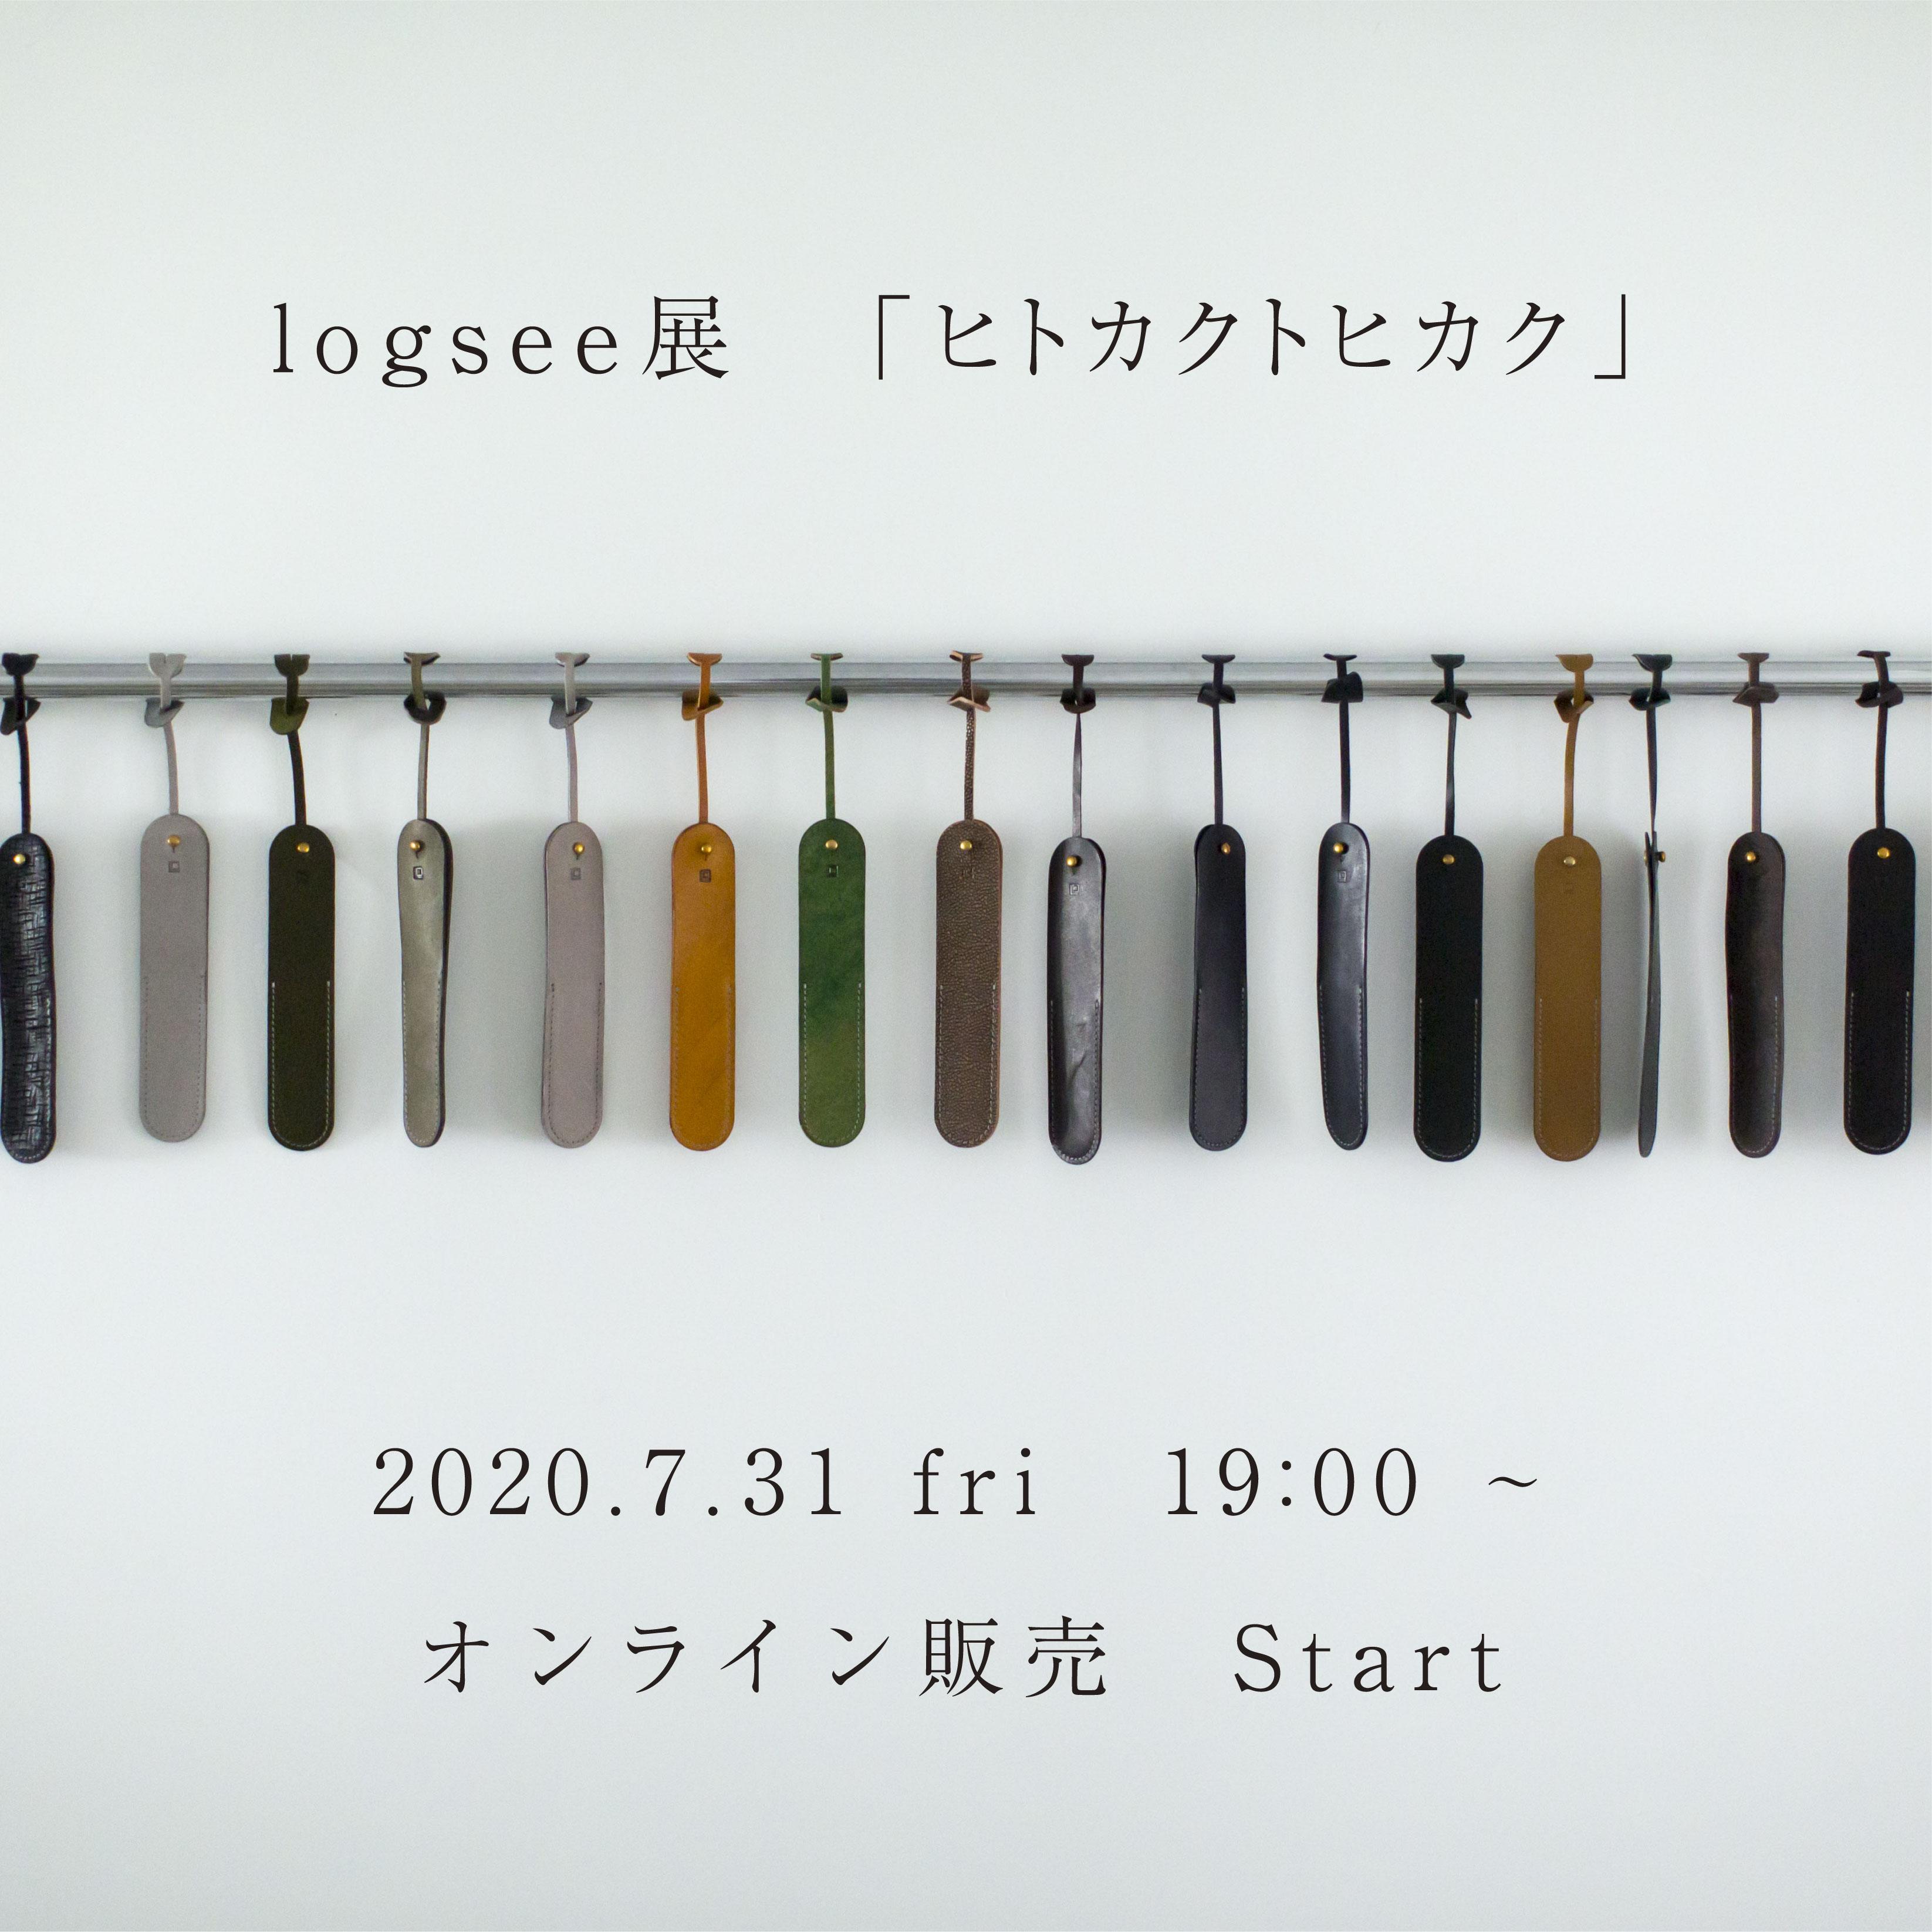 logsee展「ヒトカクトヒカク」<br>オンライン販売 Start